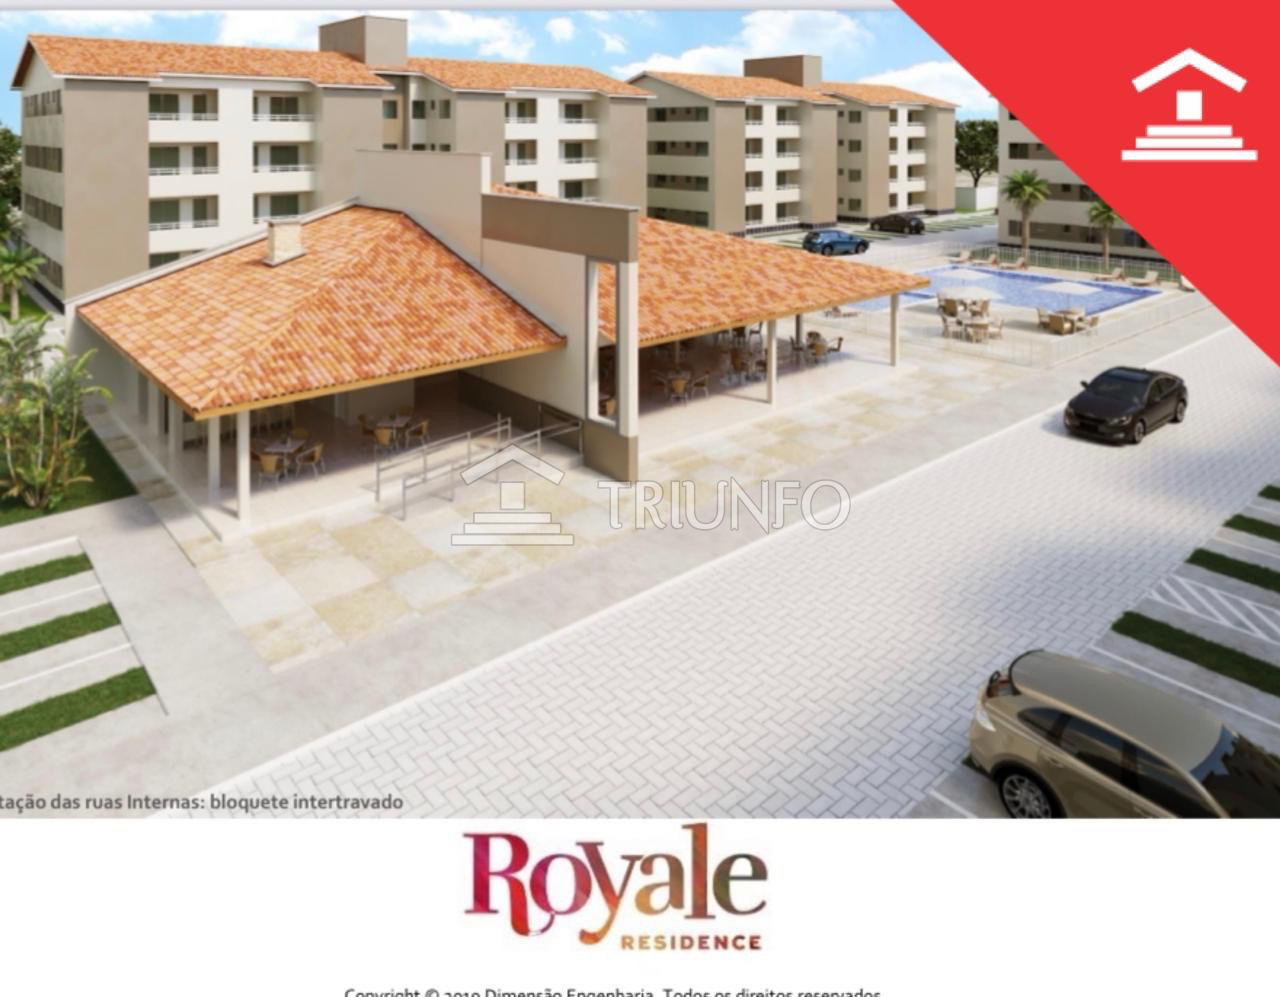 Royale Residence